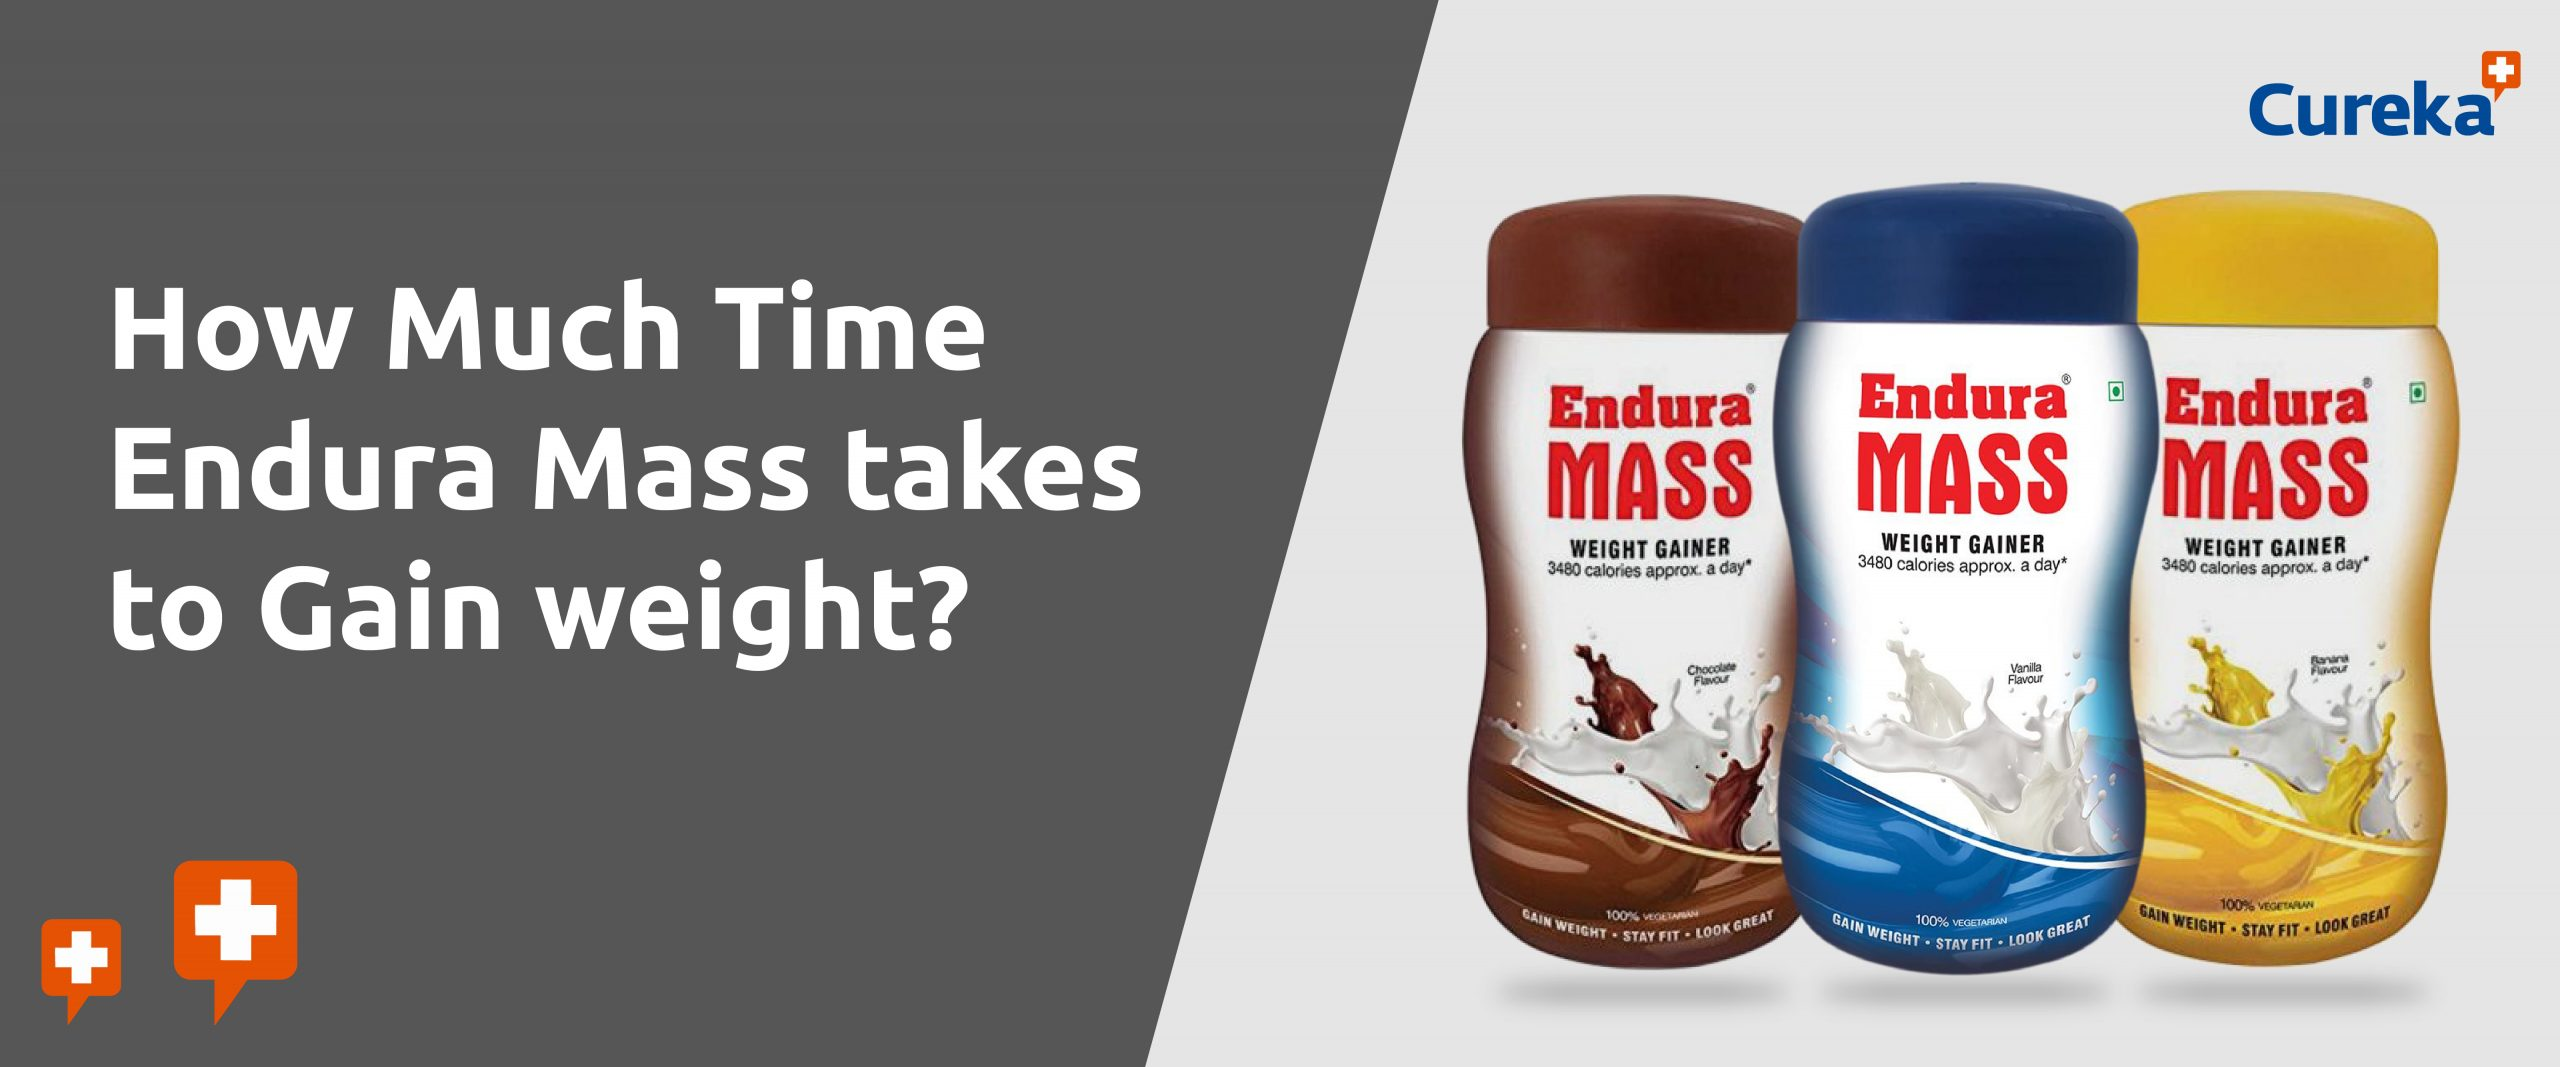 time endura mass takes to gain weight